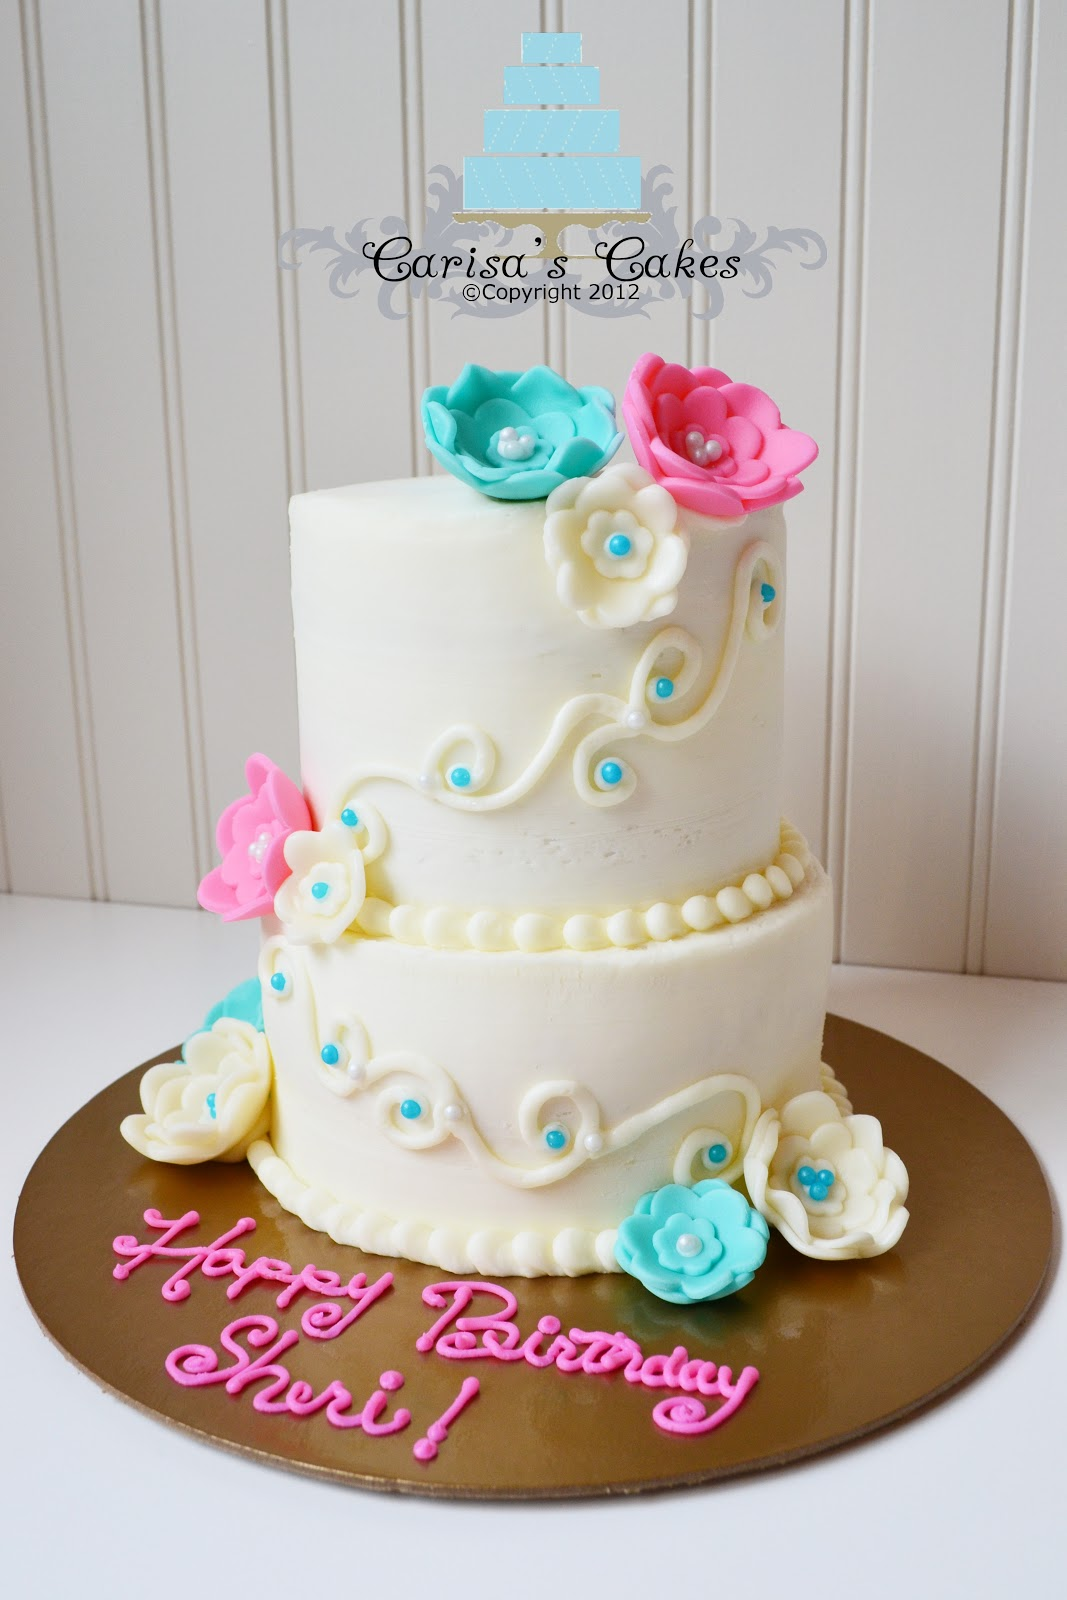 Carisas Cakes November 2012